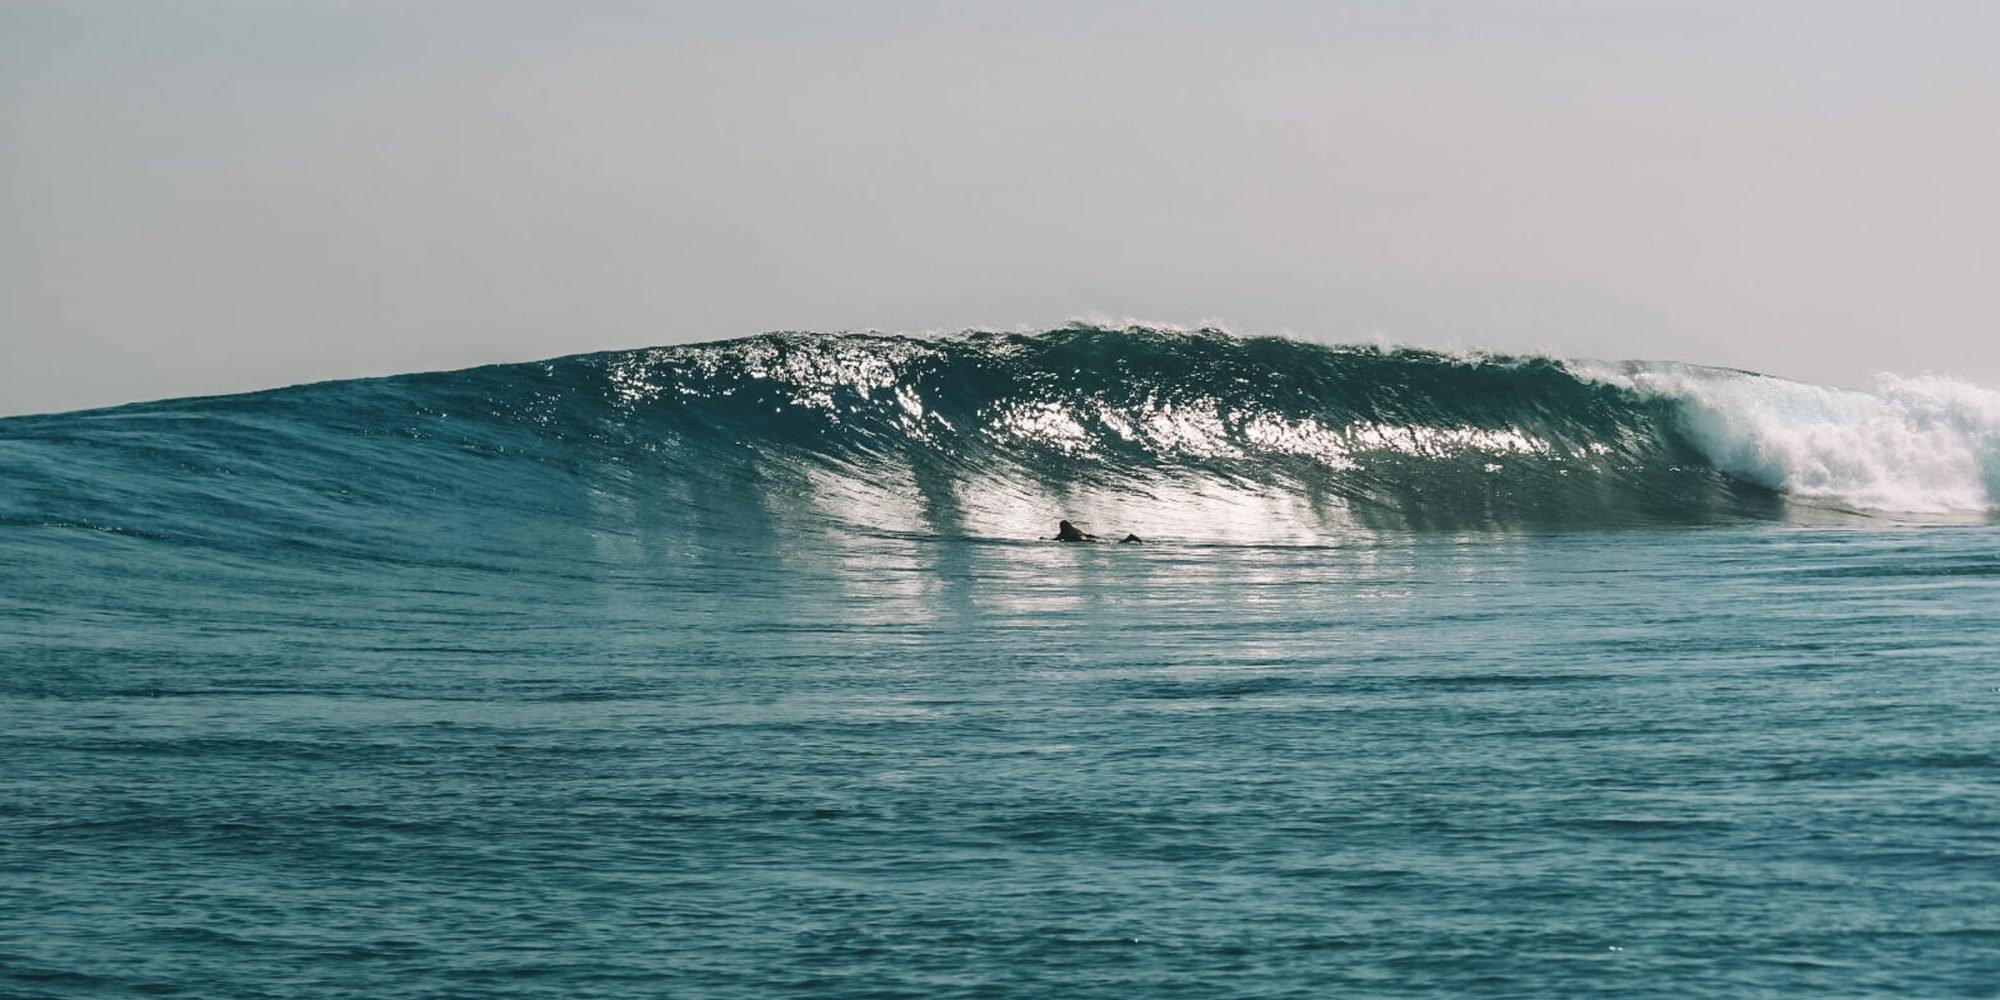 Maldives Surf Camp Waves